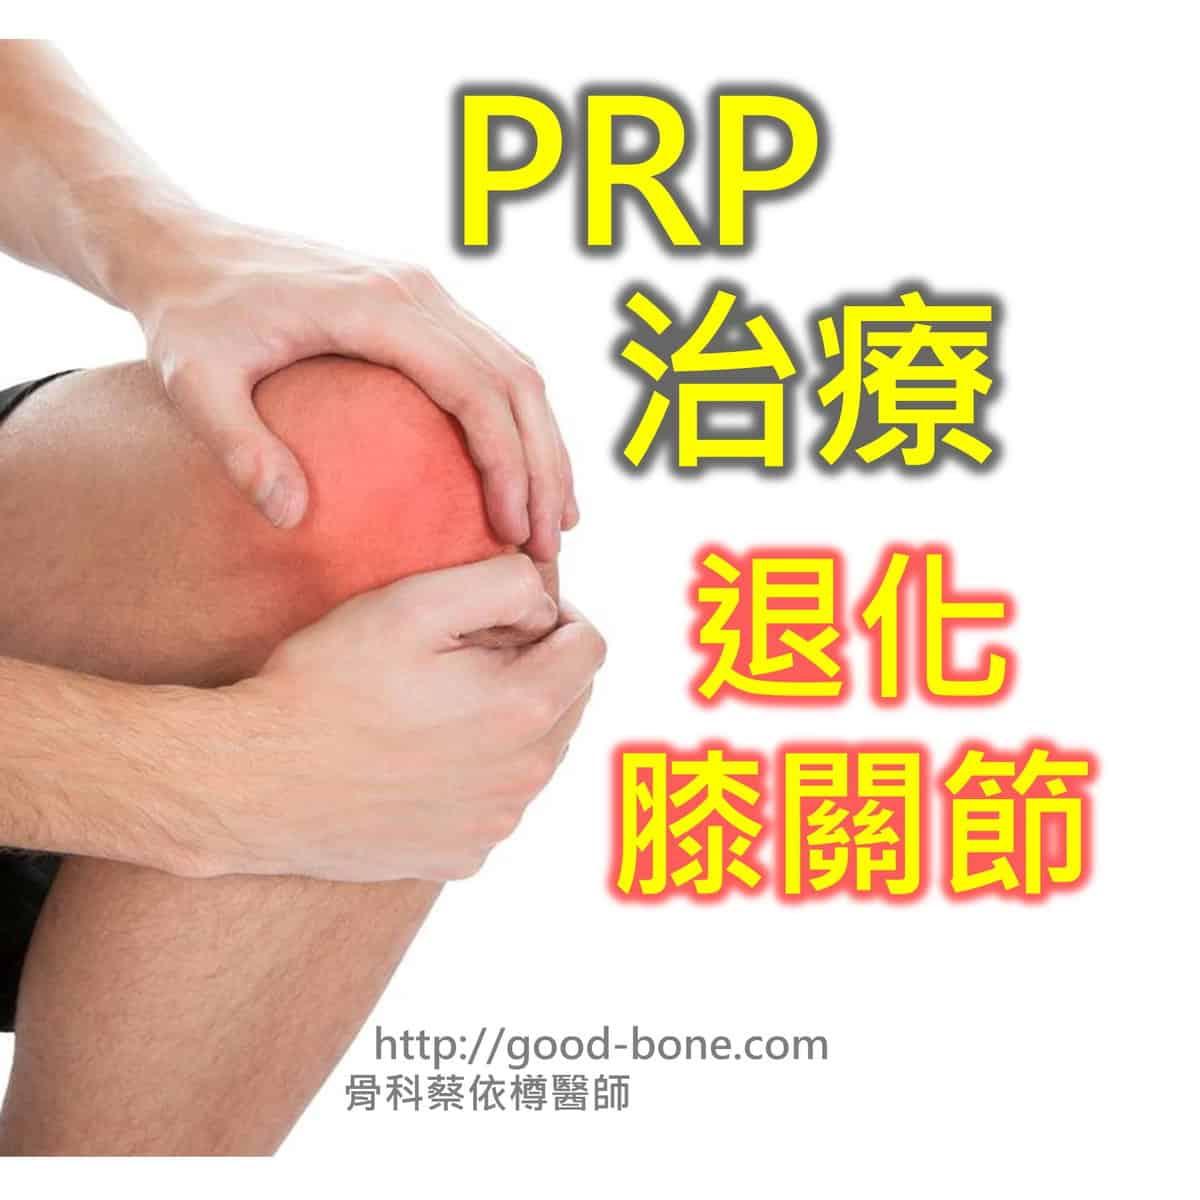 PRP 治療 退化膝關節 MB 骨科蔡依樽醫師 https://good-bone.com/